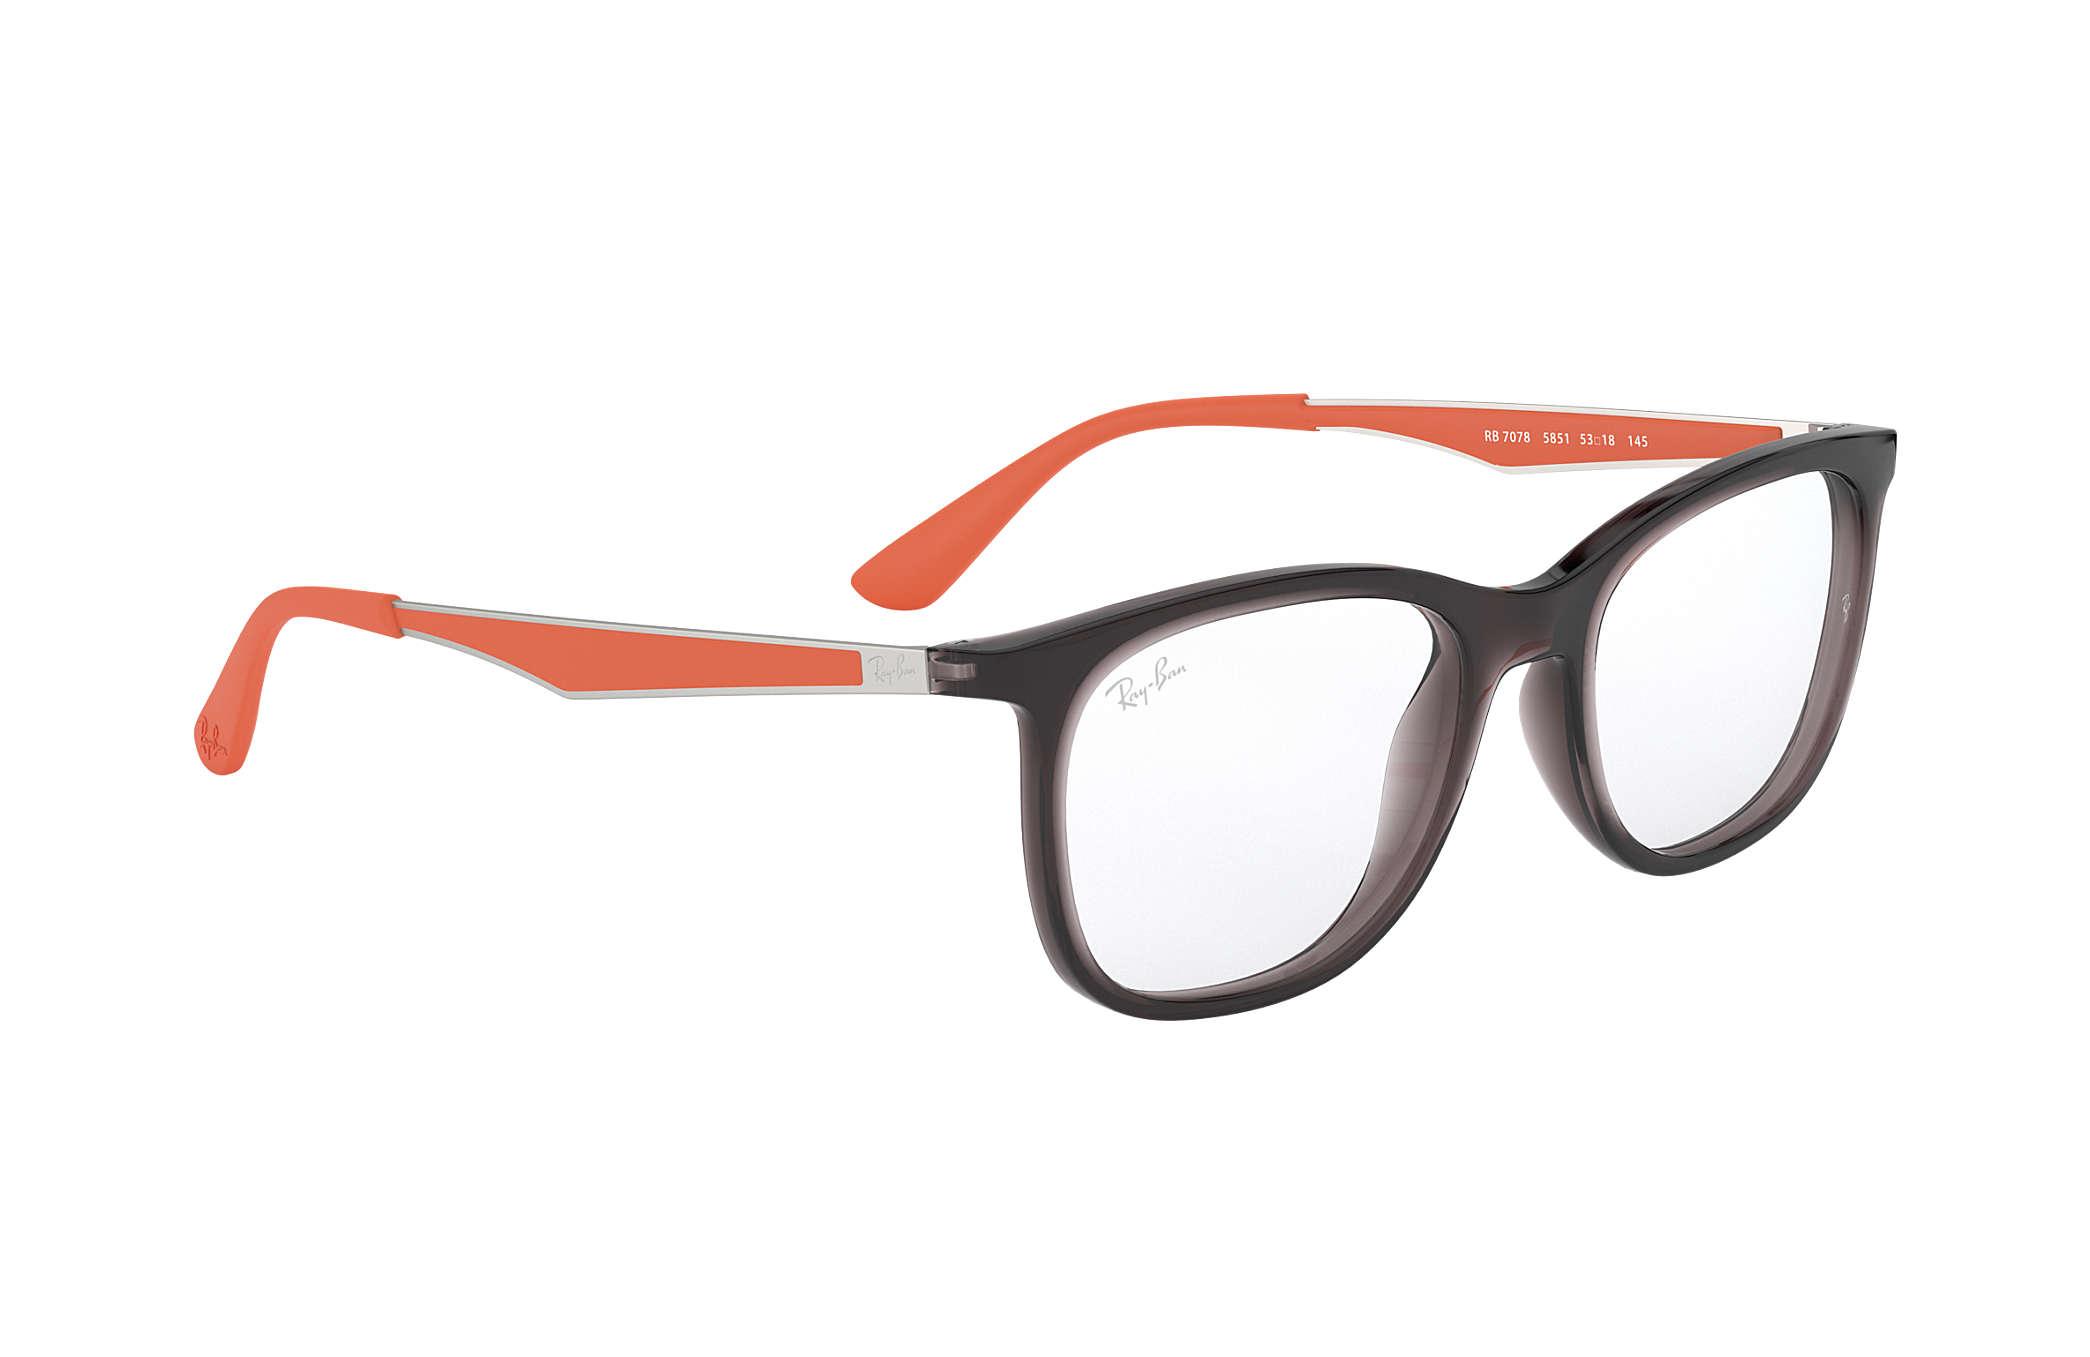 941a2c370b Ray-Ban prescription glasses RB7078 Grey - Injected - 0RX7078585153 ...